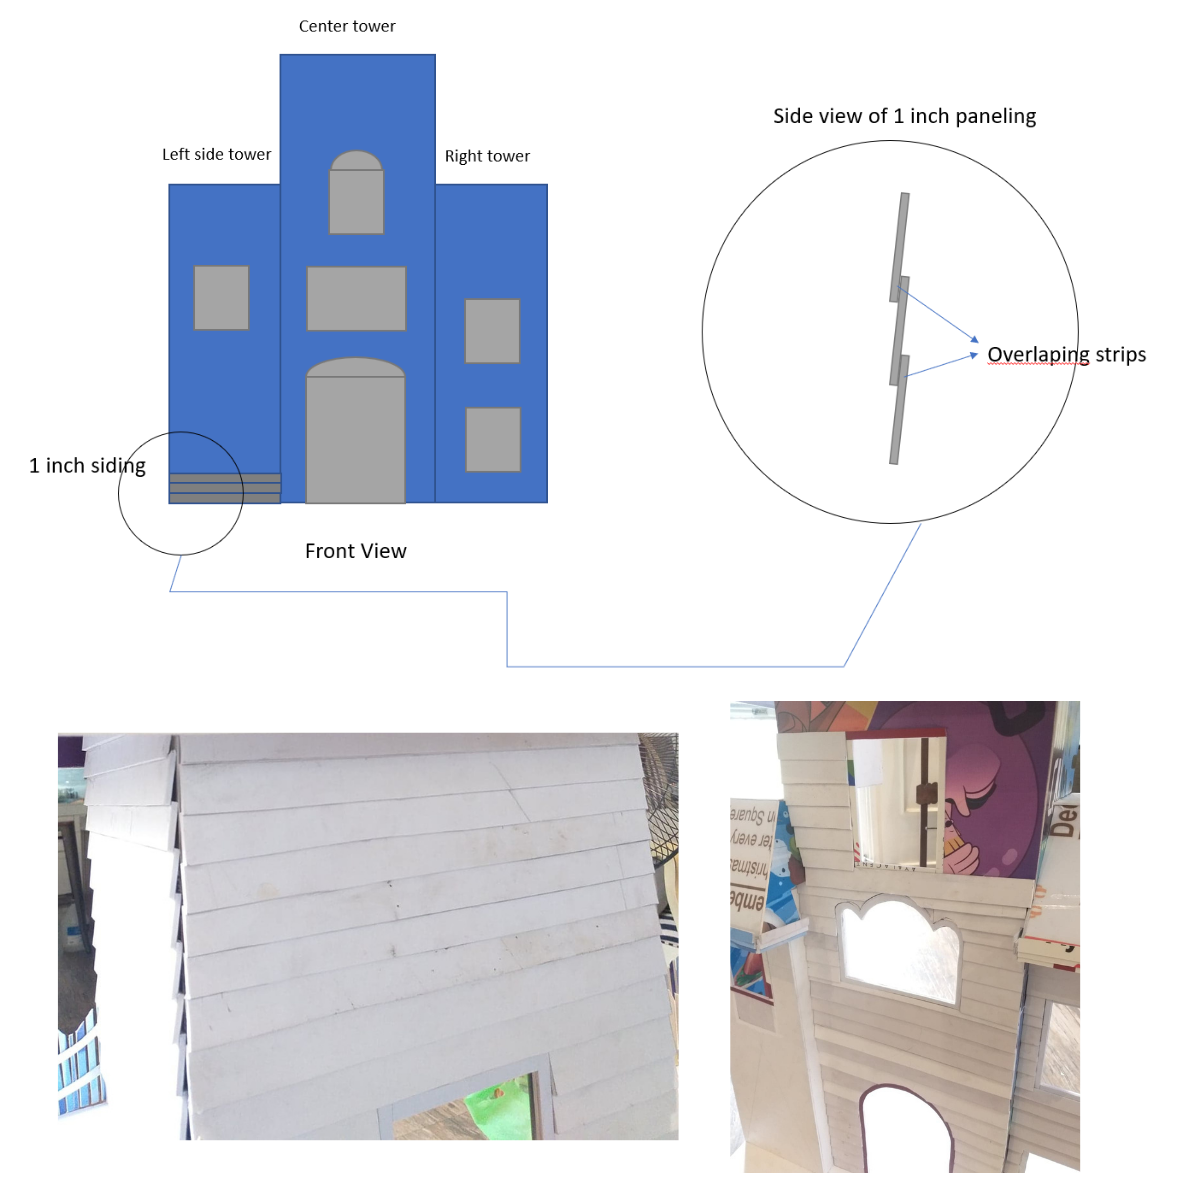 Siding/Paneling